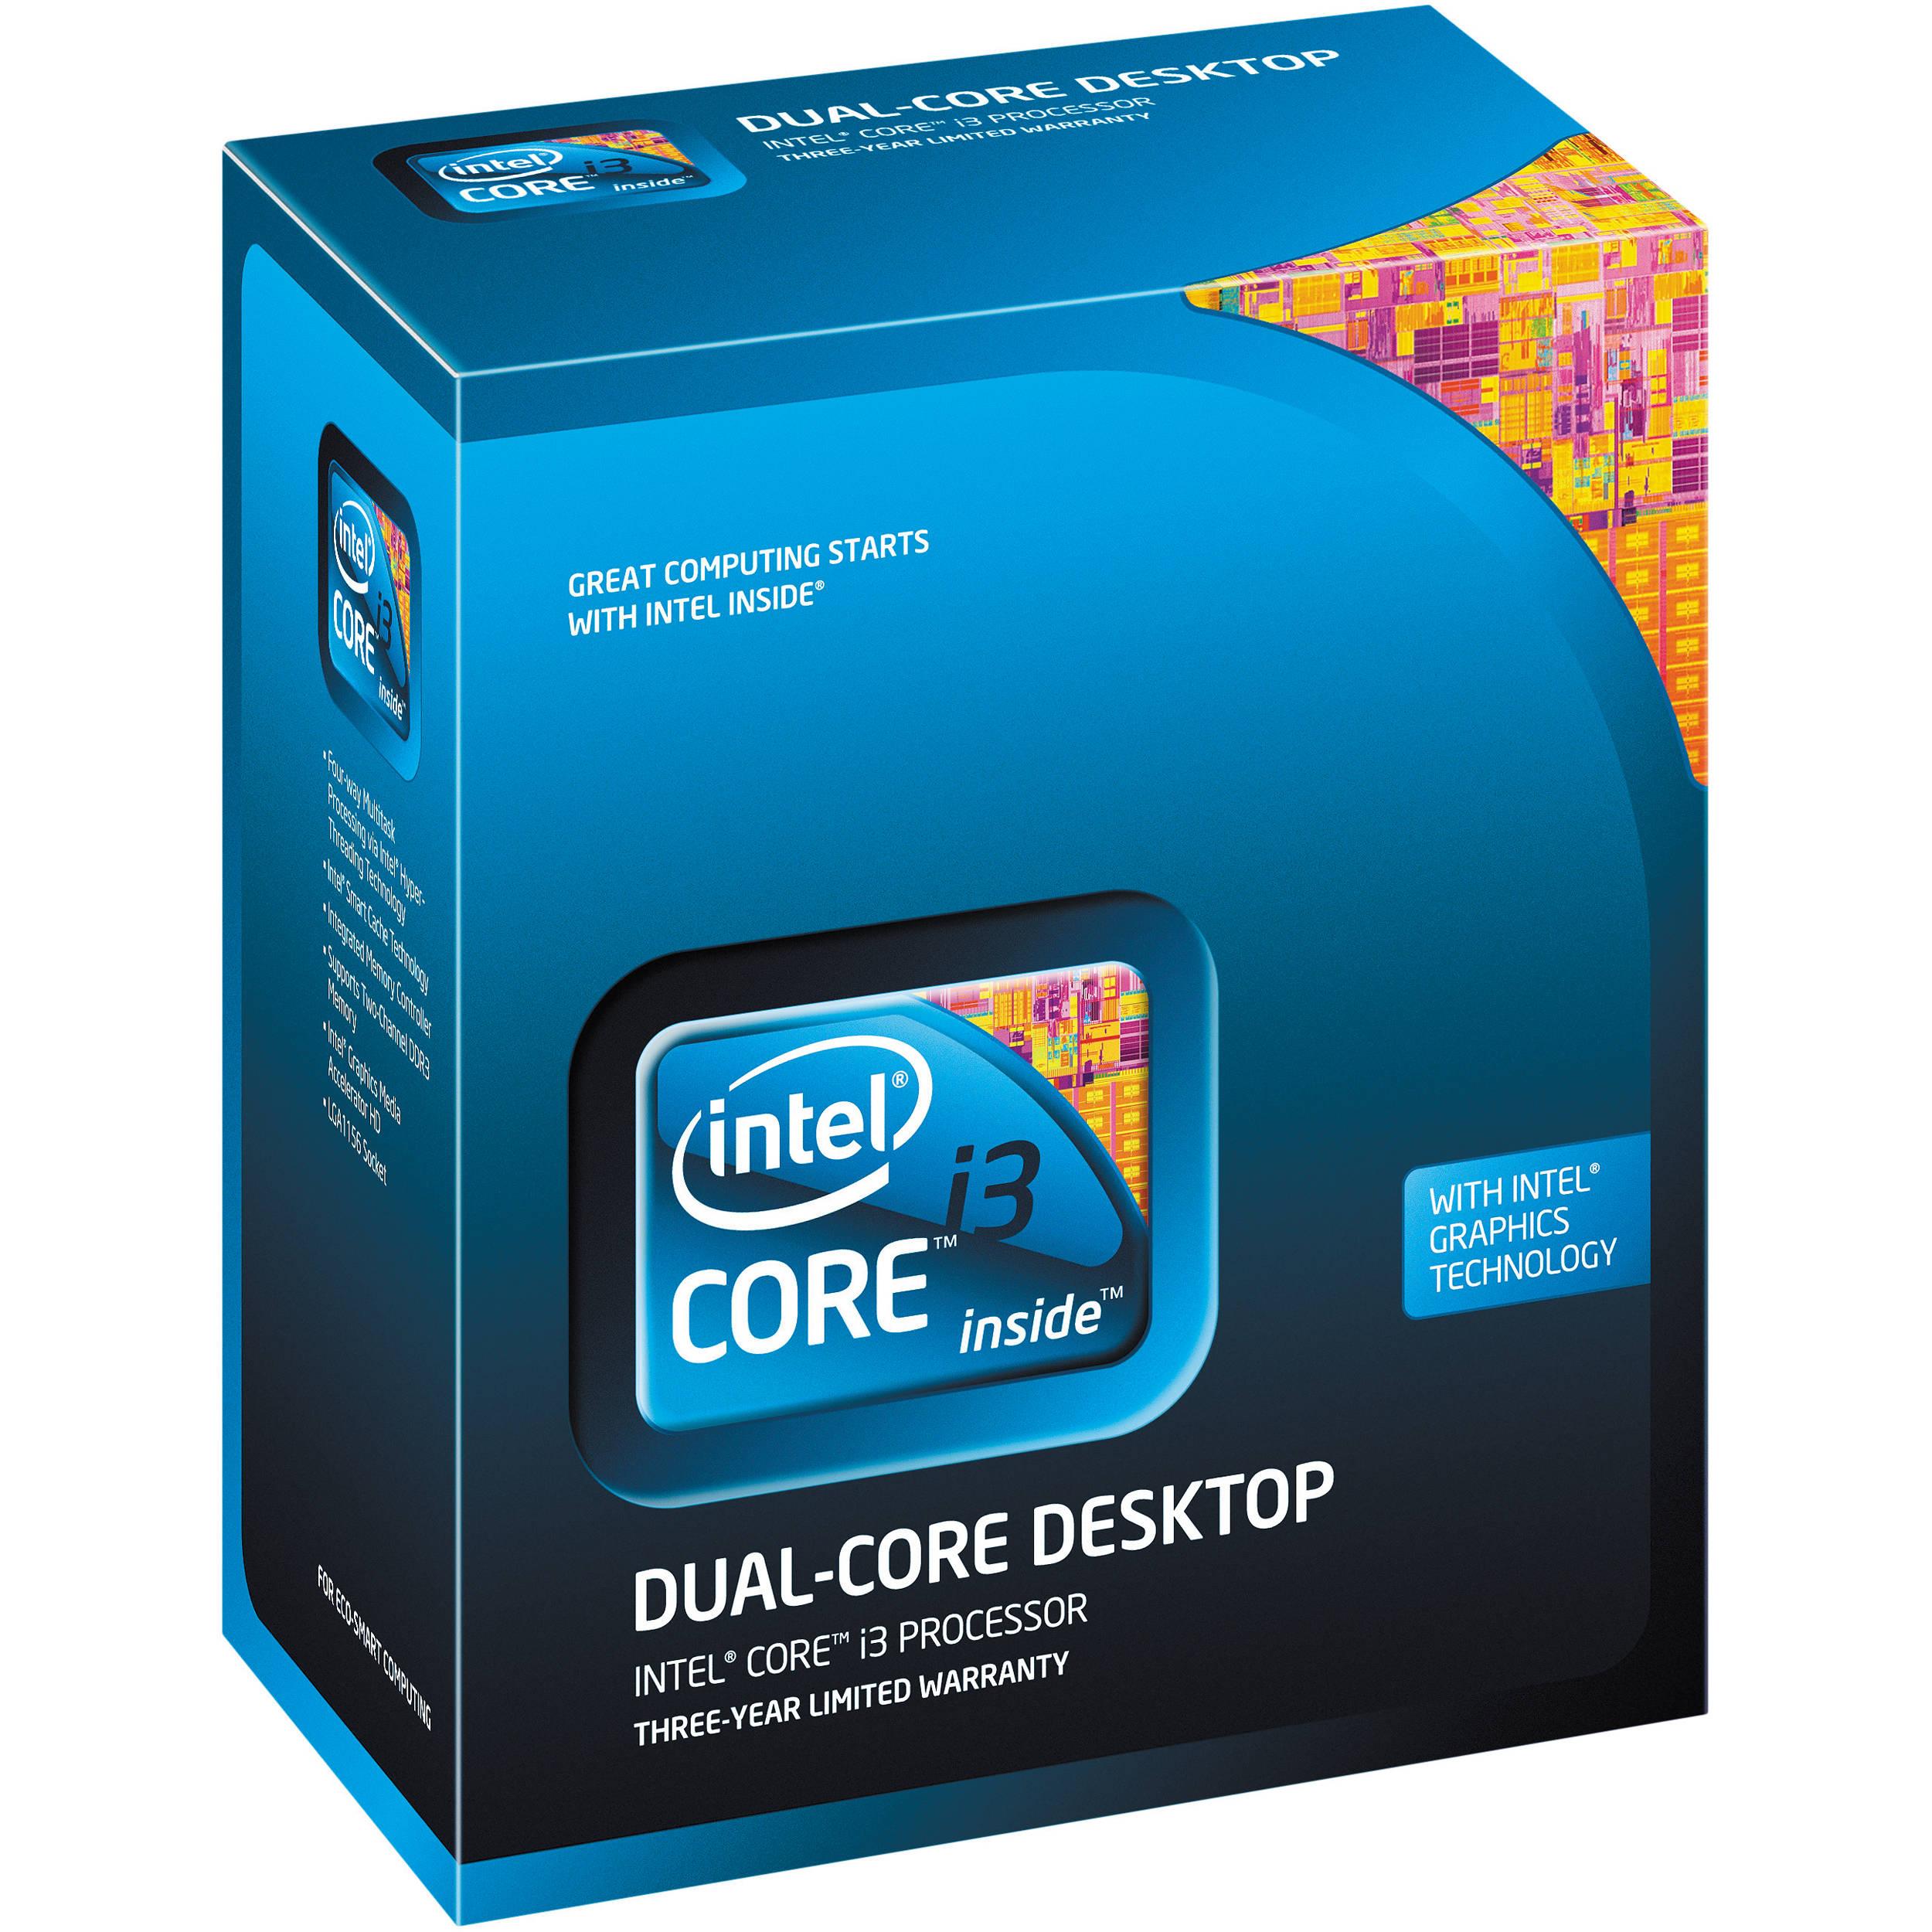 Intel bx80623i32120 intel core i3 2120-3.3 ghz 4 threads 2 cores